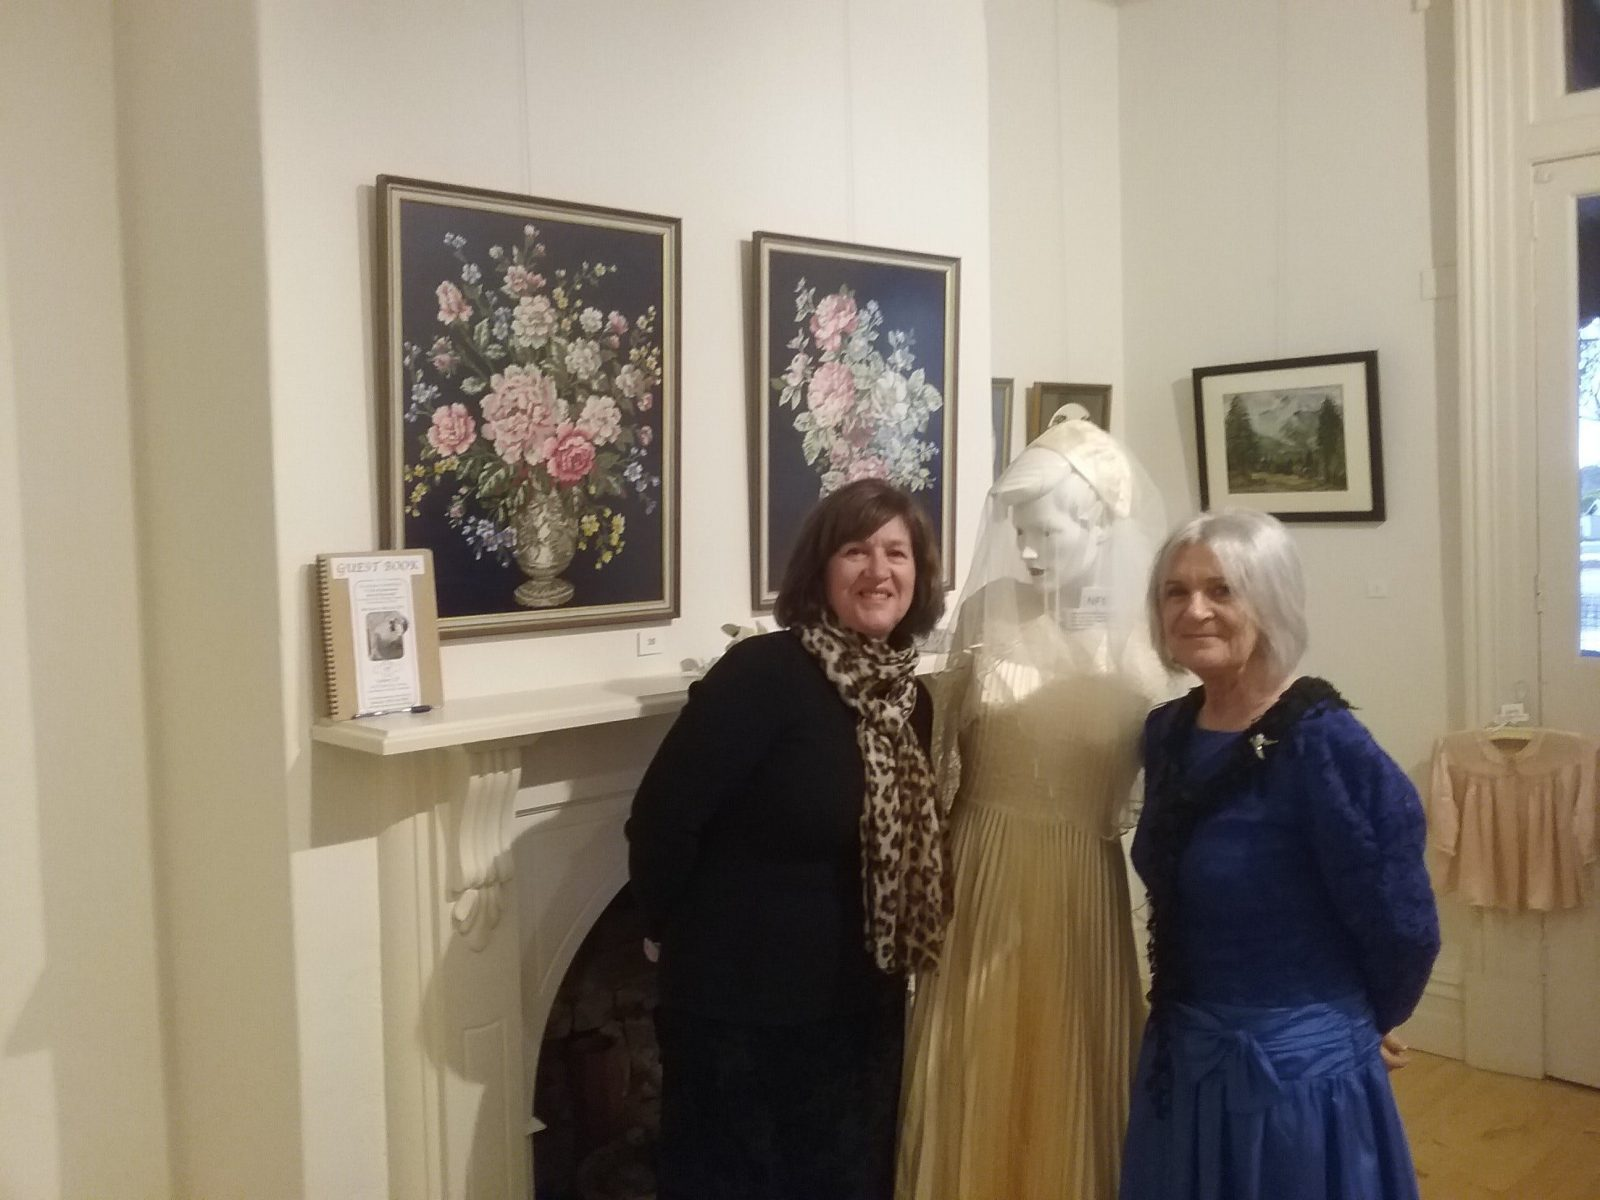 Elva Barker Exhibition: A Life of Inspiration Born of Necessity